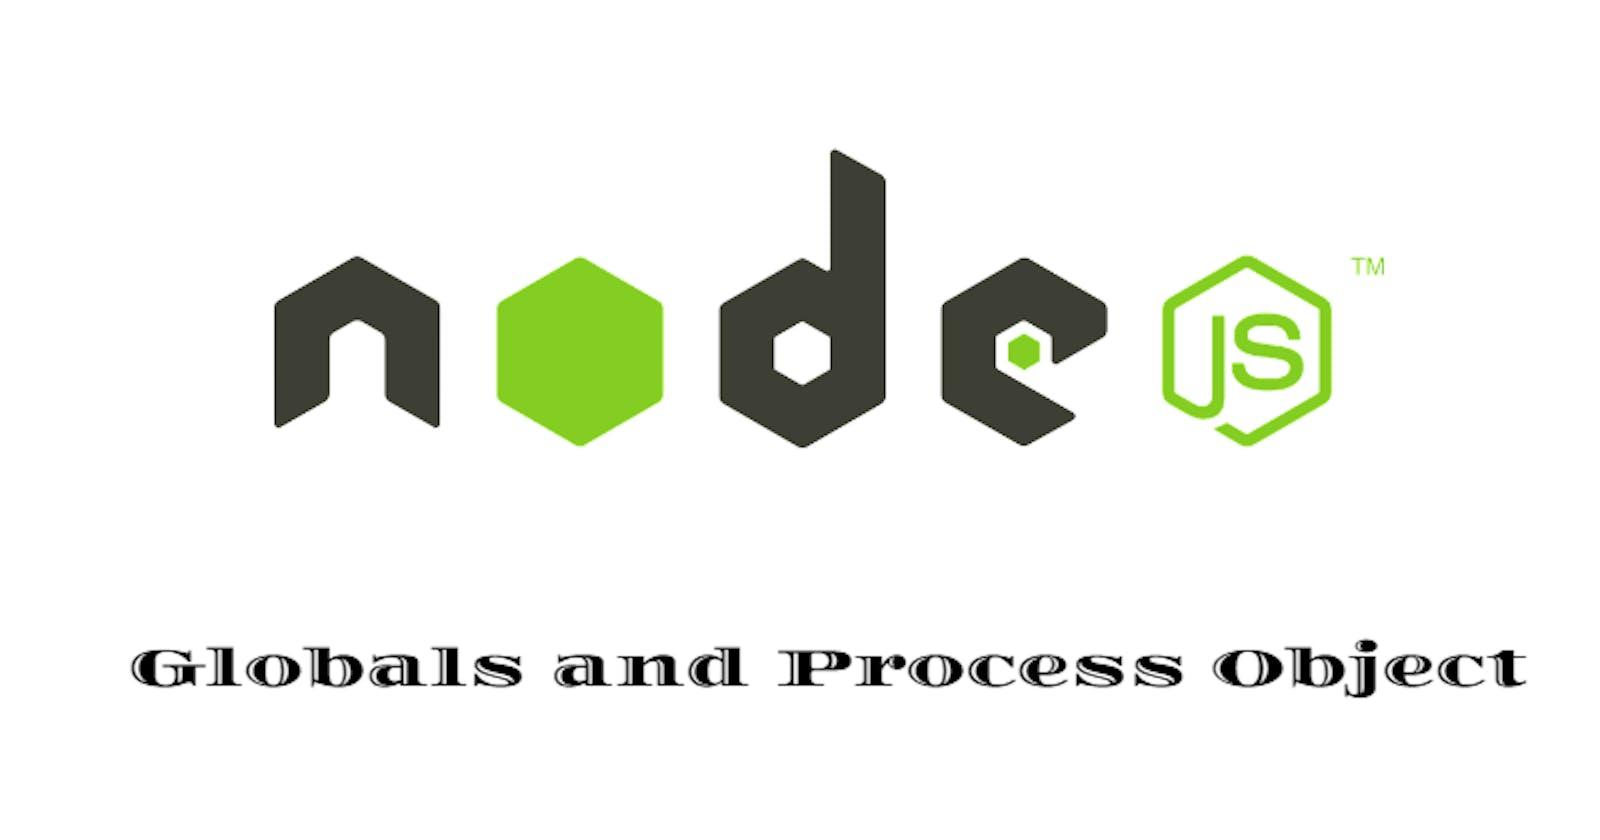 Node.js Important Globals and Process Object